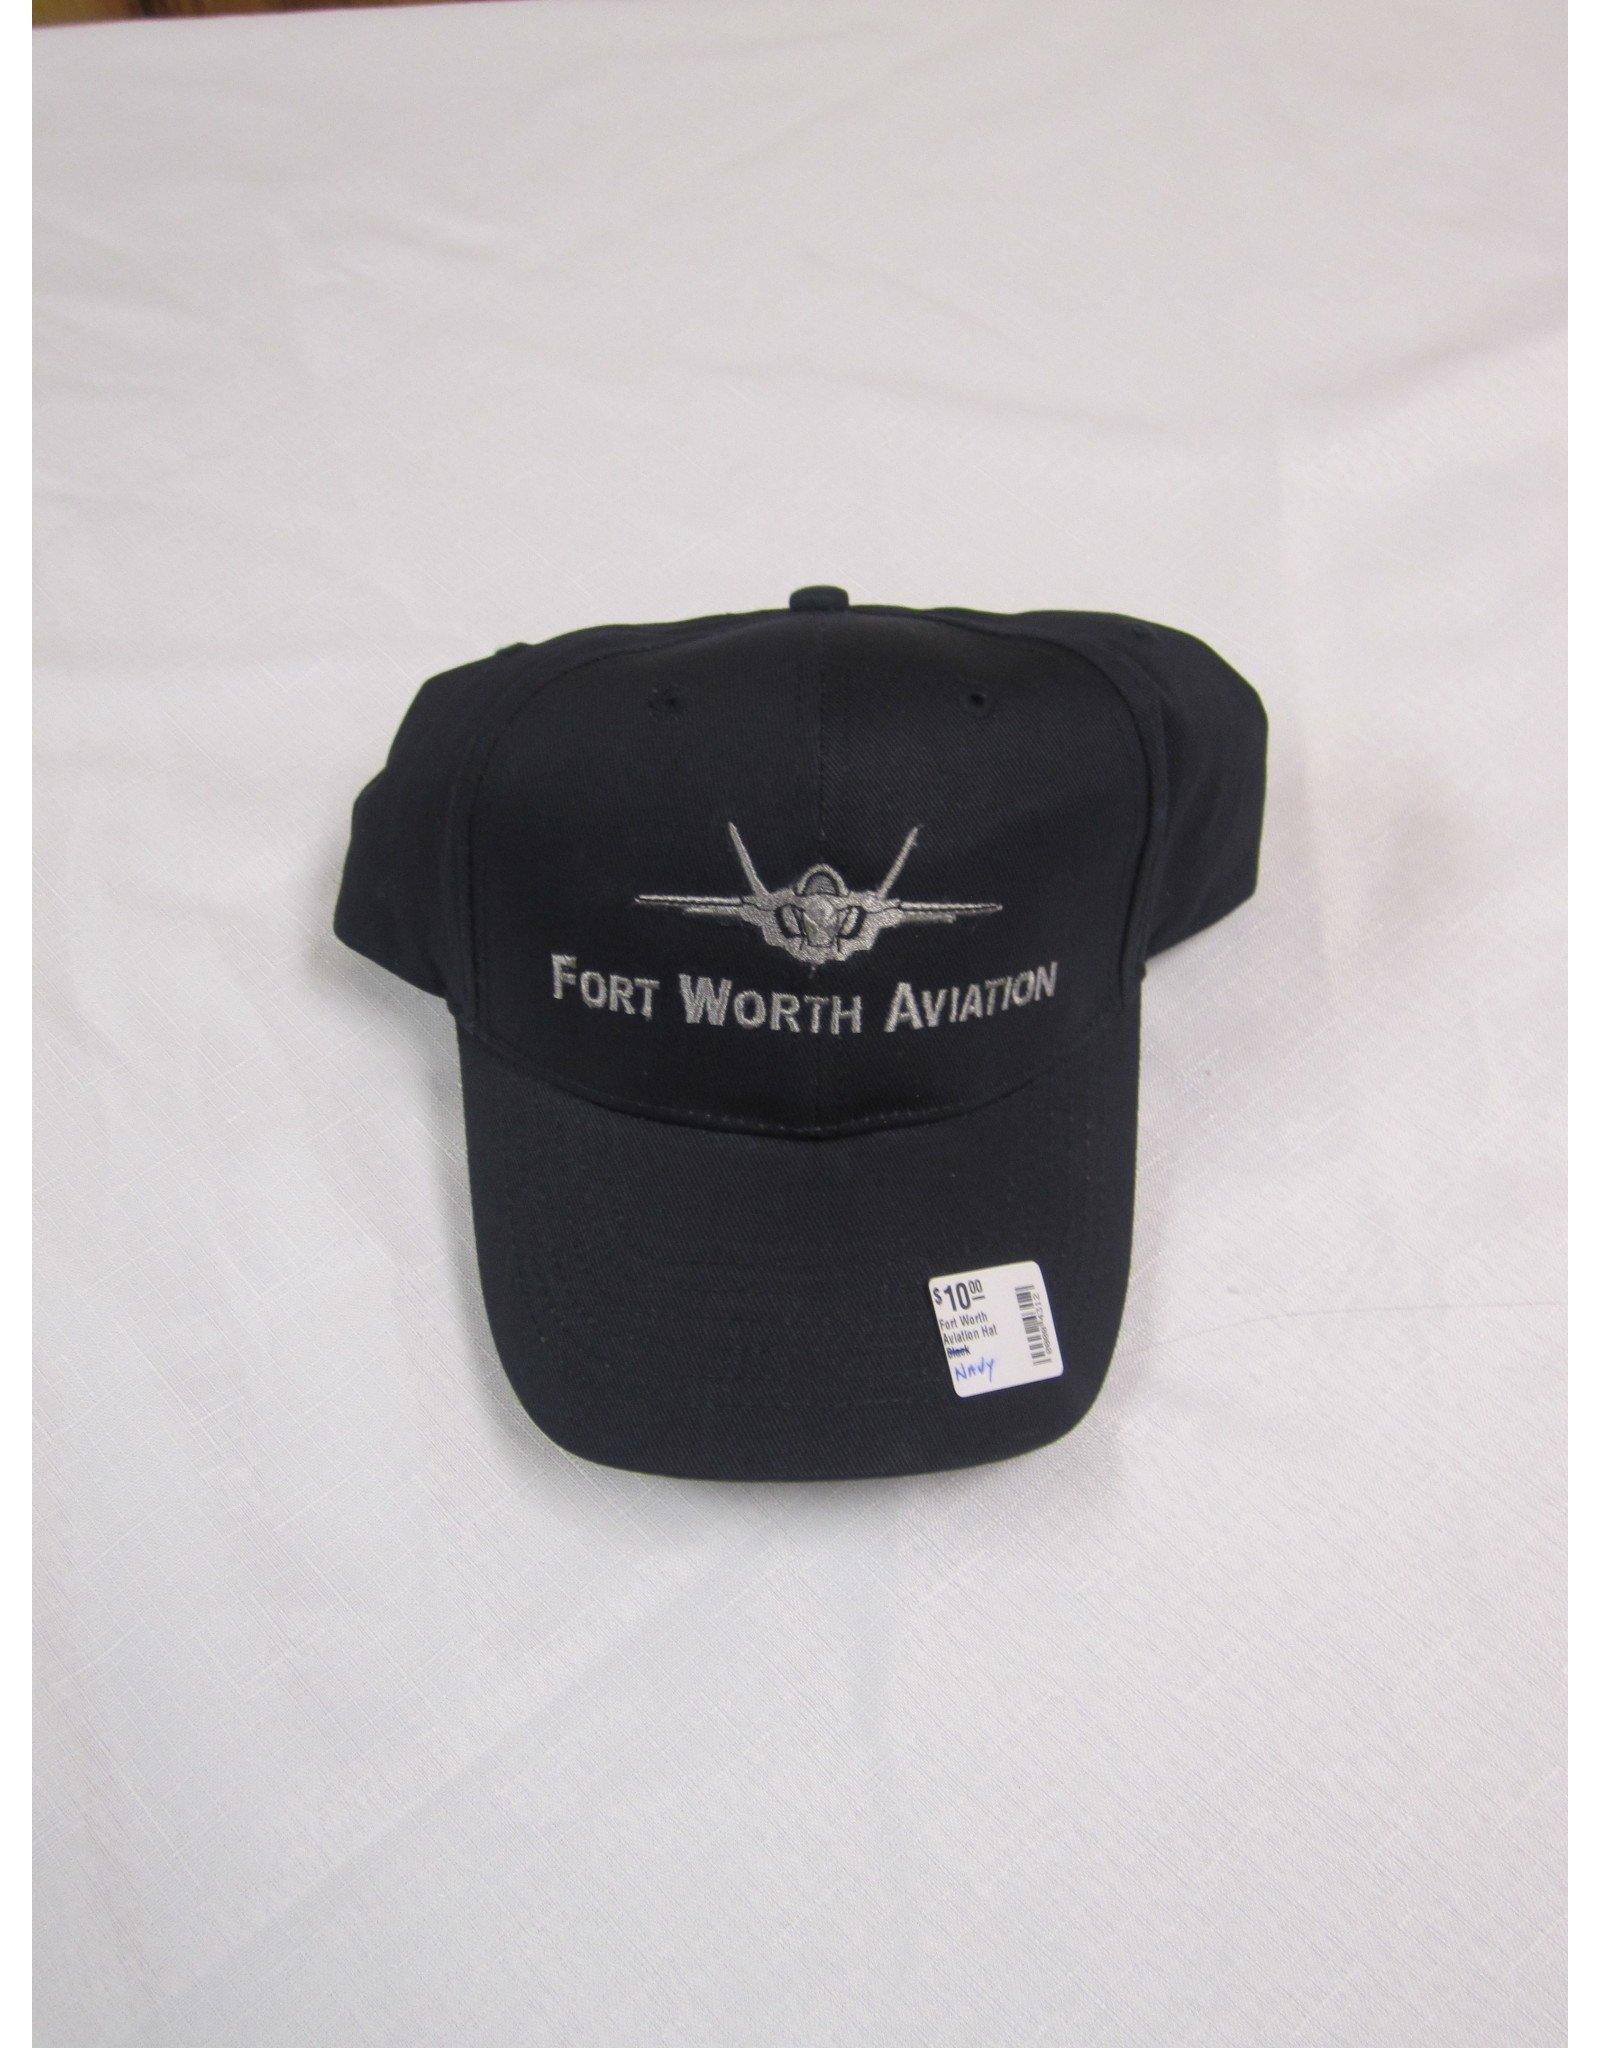 Fort Worth Aviation Hat